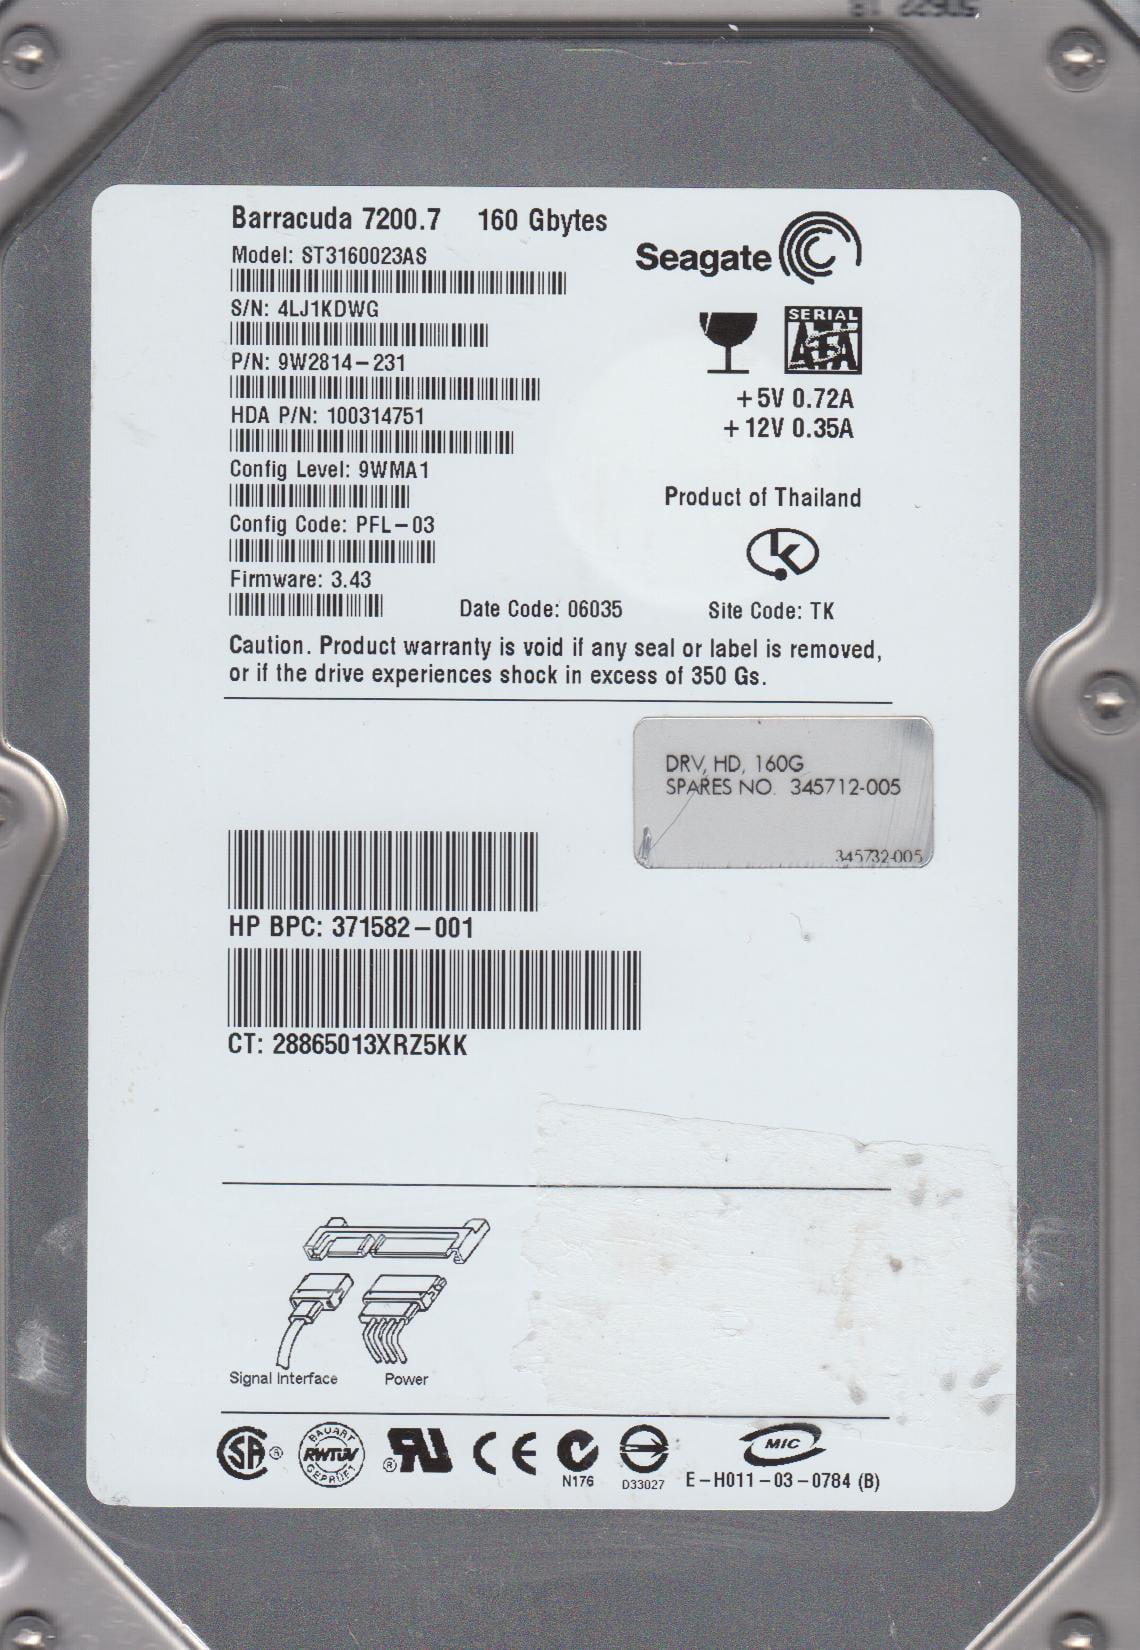 ST3160023AS, 4MT, TK, PN 9W2814-231, FW 3.43, Seagate 160GB SATA 3.5 Hard Drive by Seagate